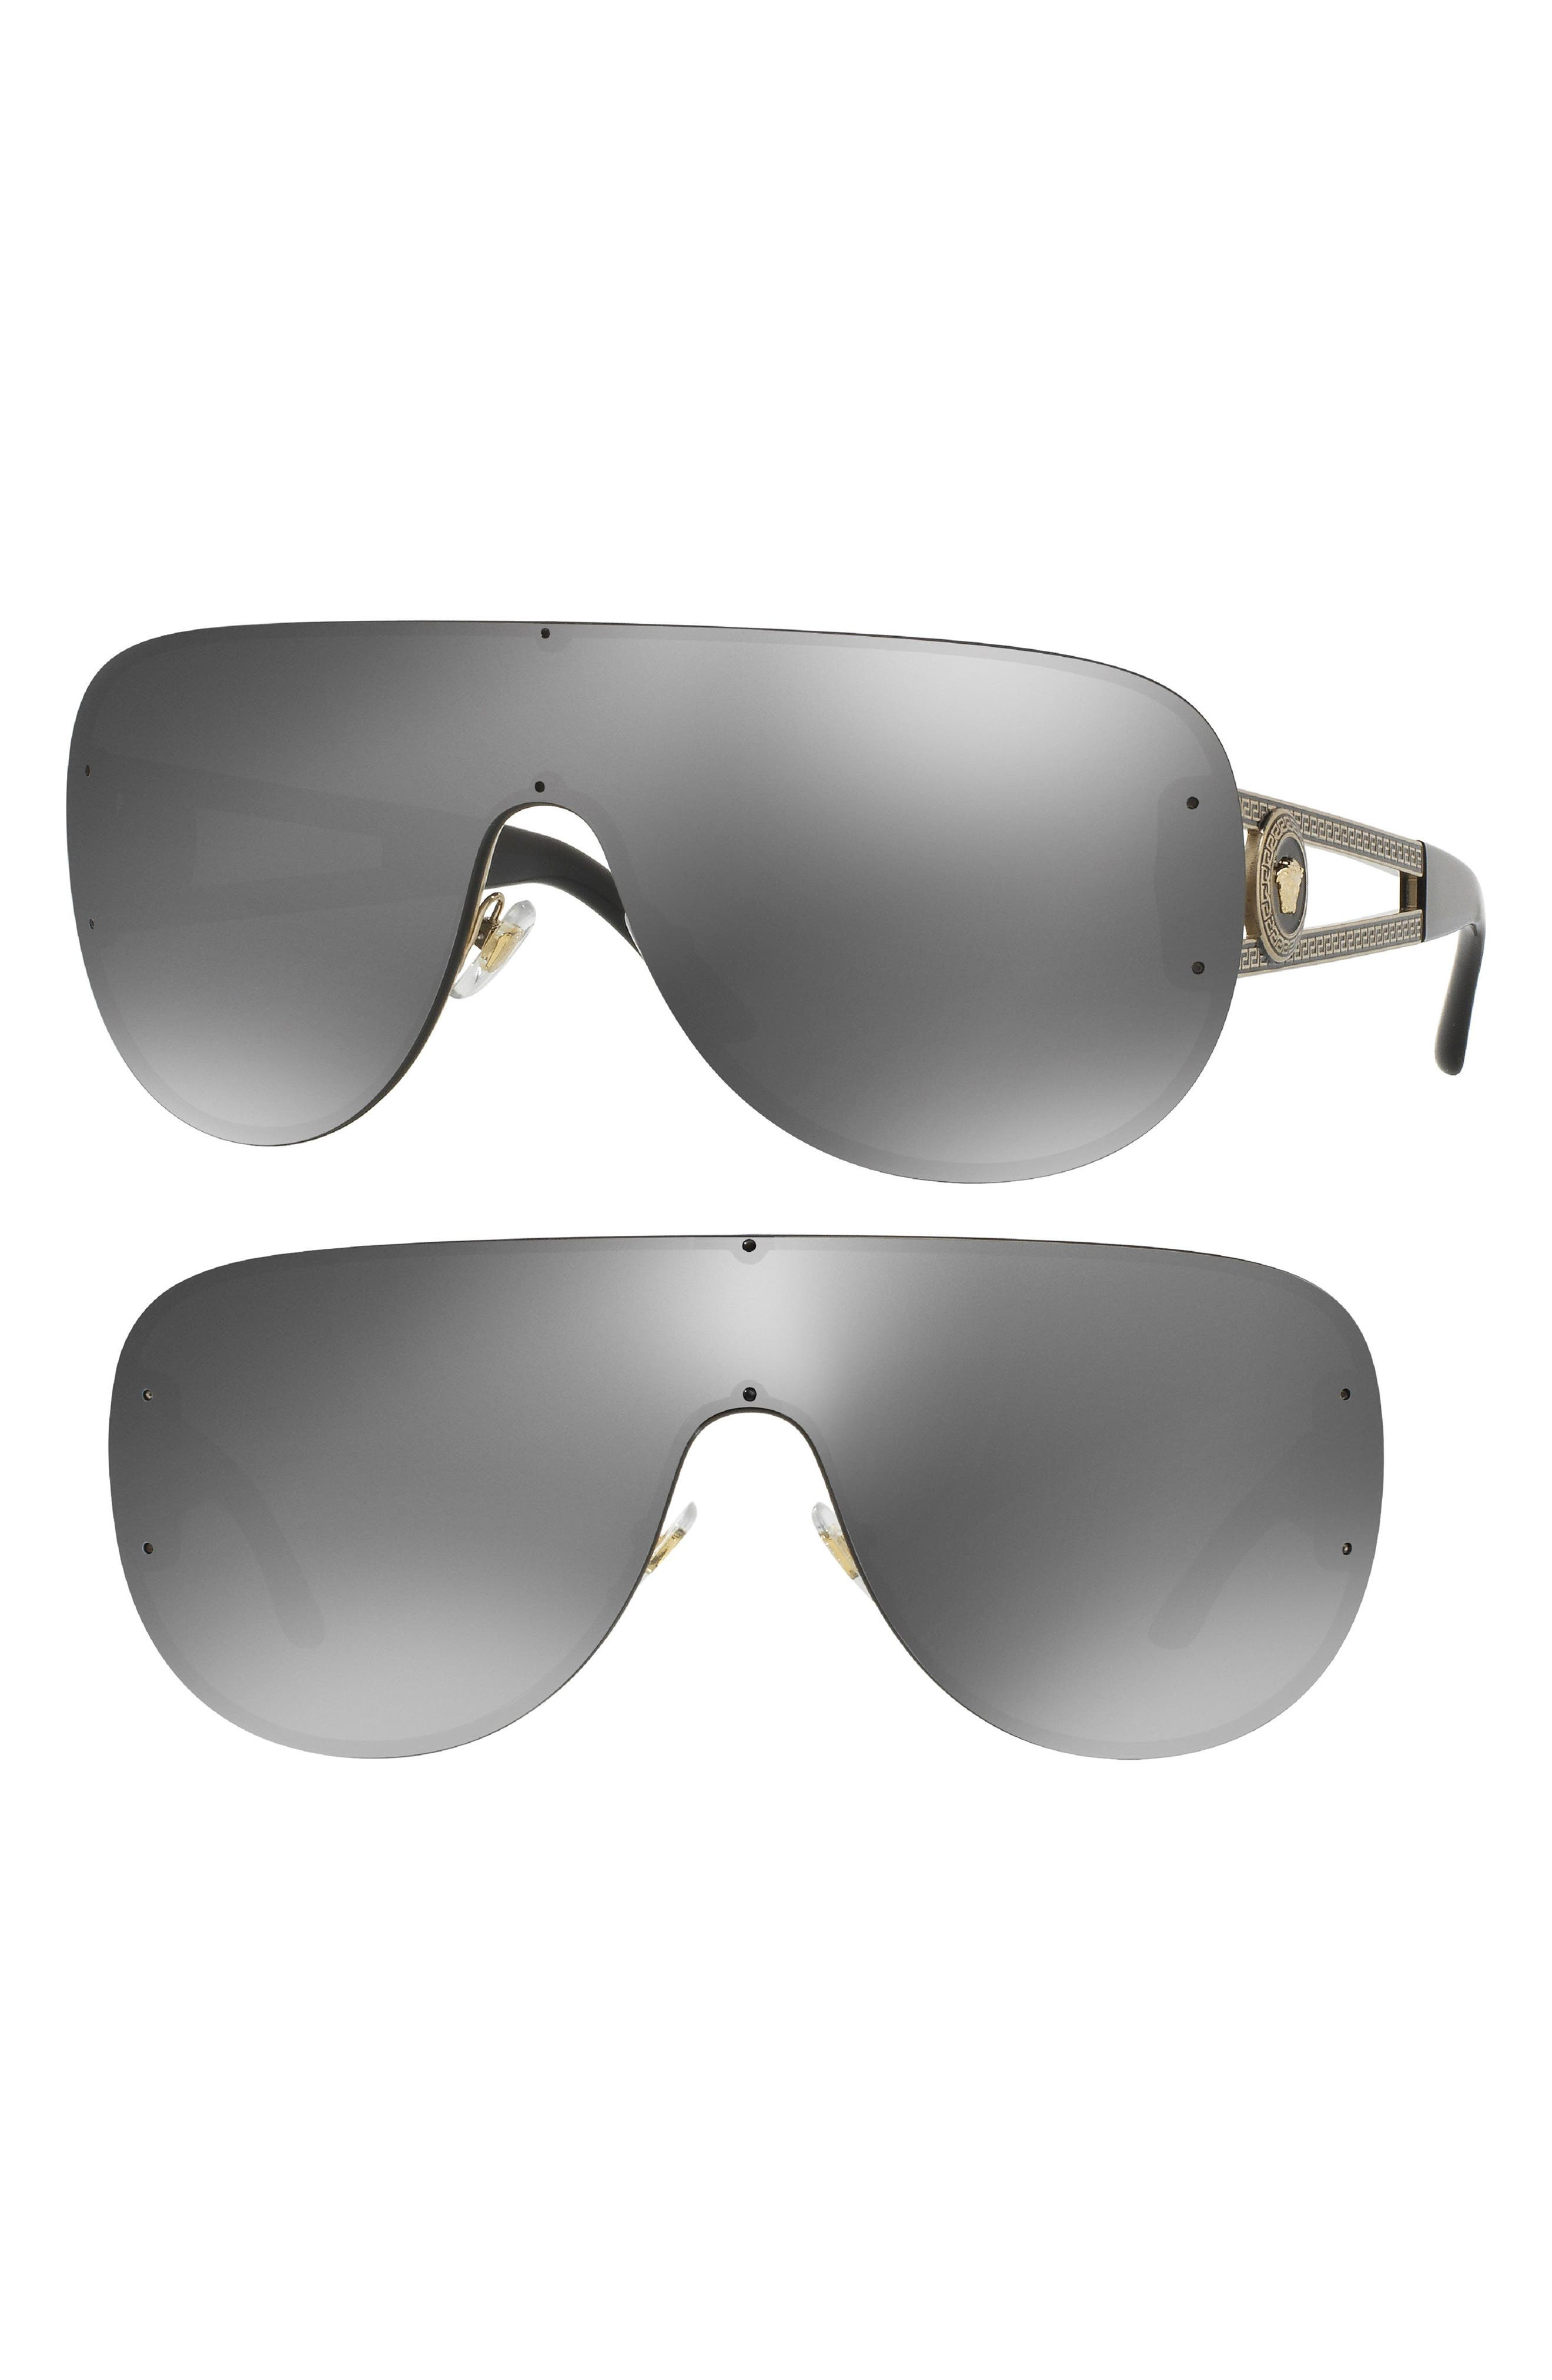 553ba402931 Women s Versace Shield Sunglasses - Grey  Gradient